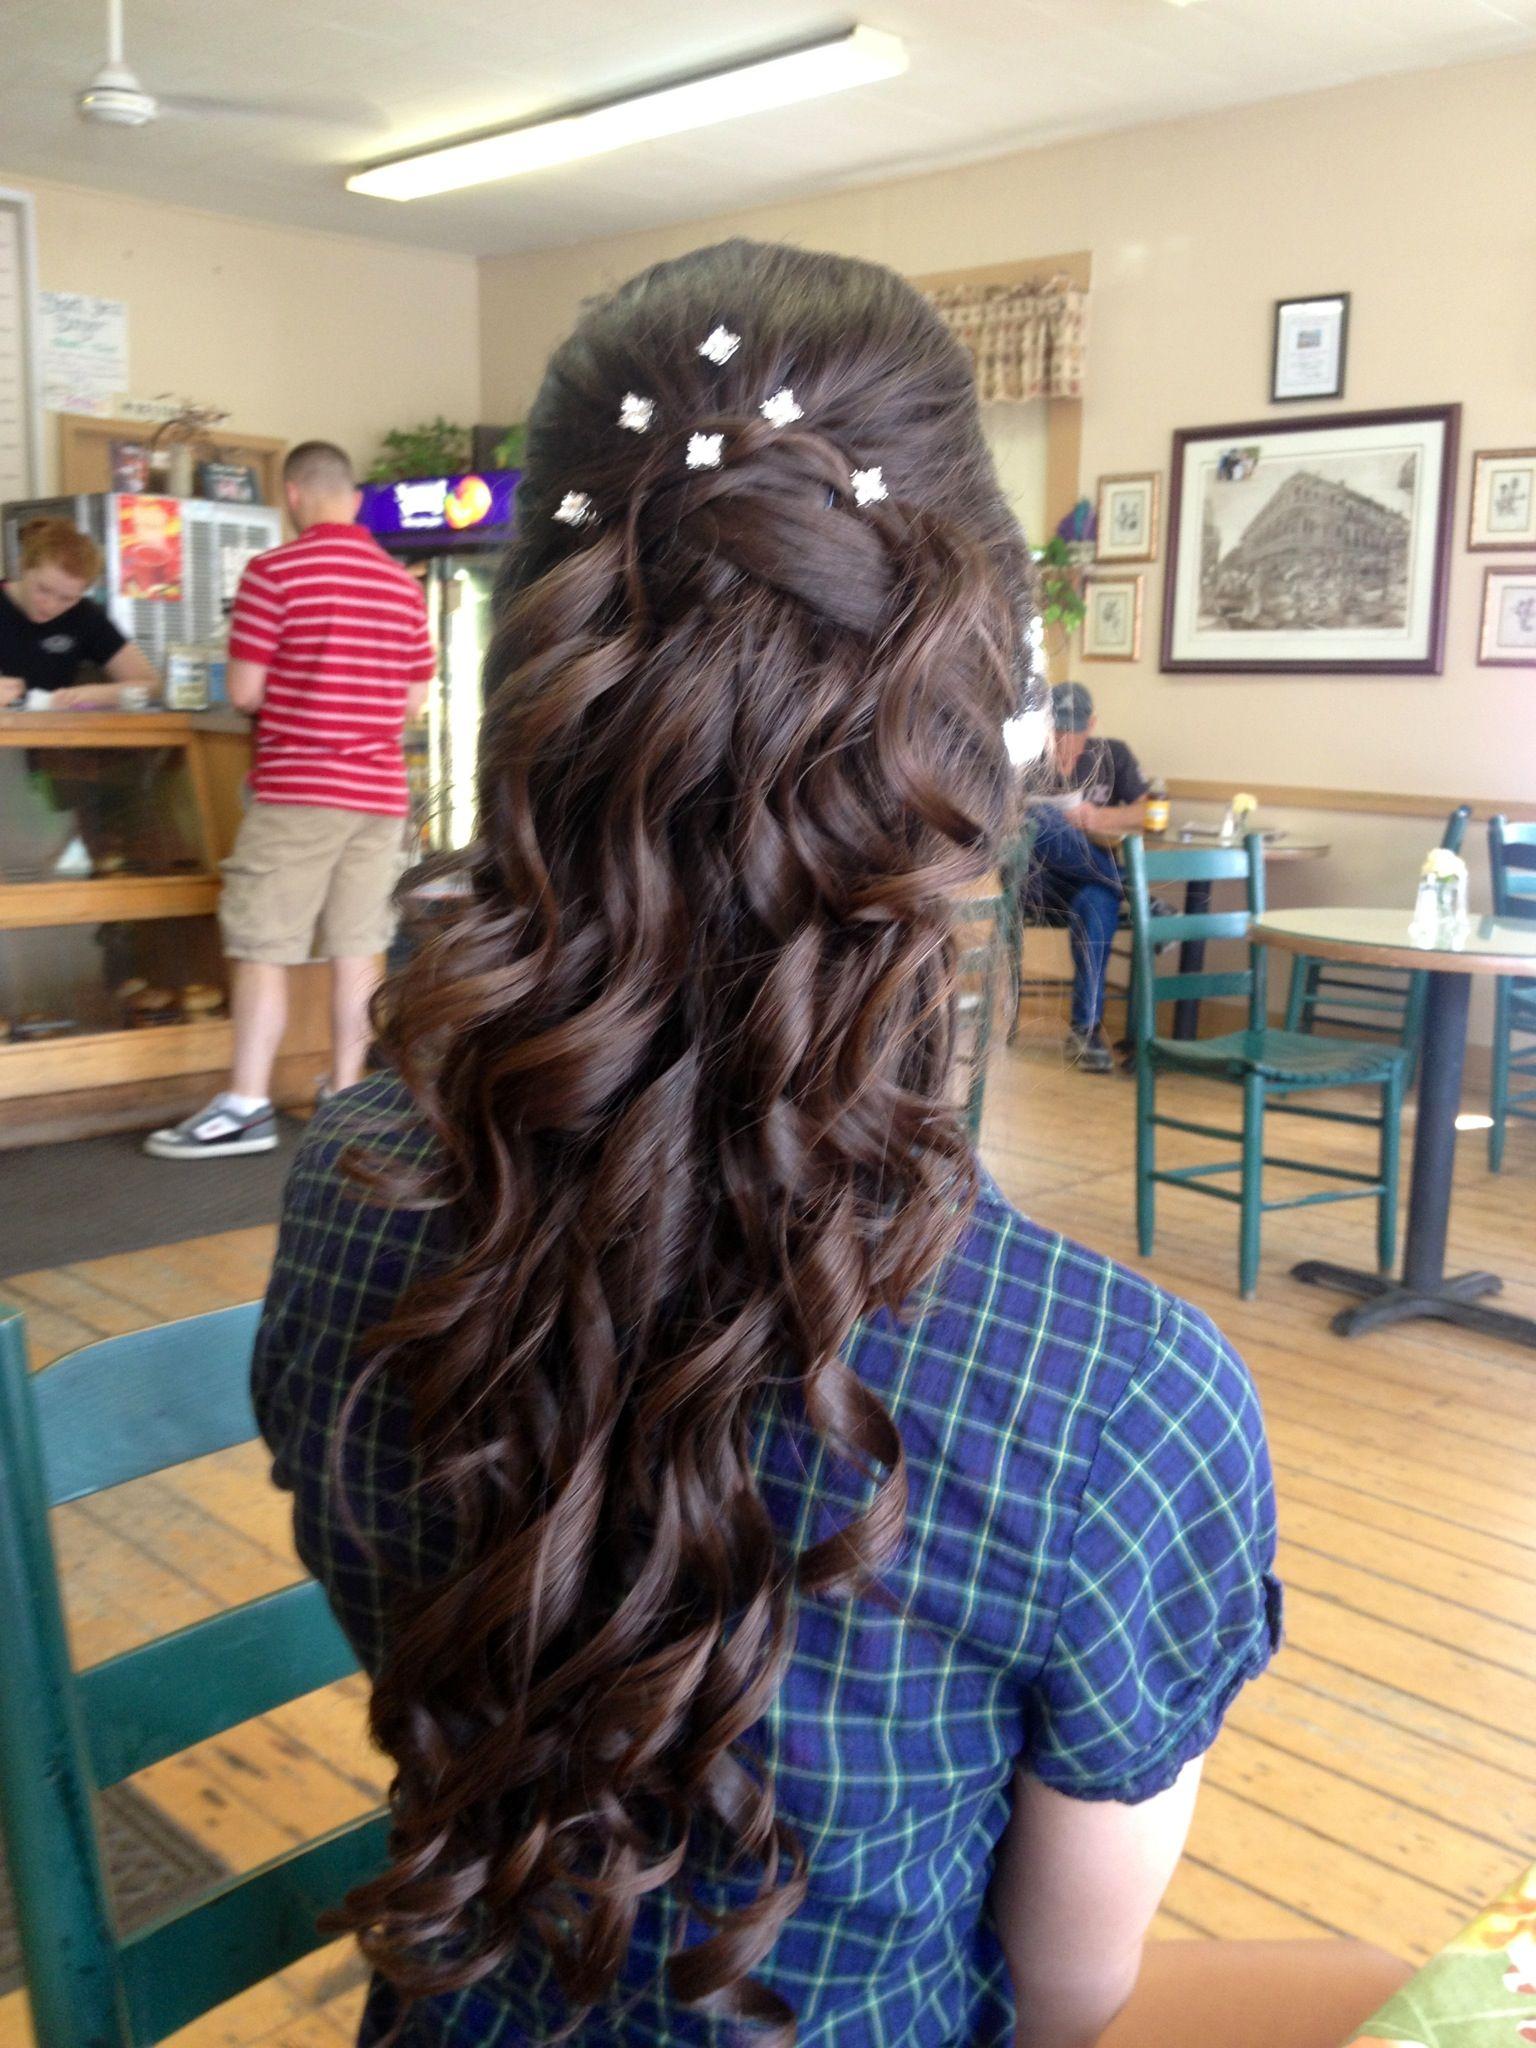 Pin By Karli Reynolds On Hair Hair Styles Dance Hairstyles Pretty Hairstyles